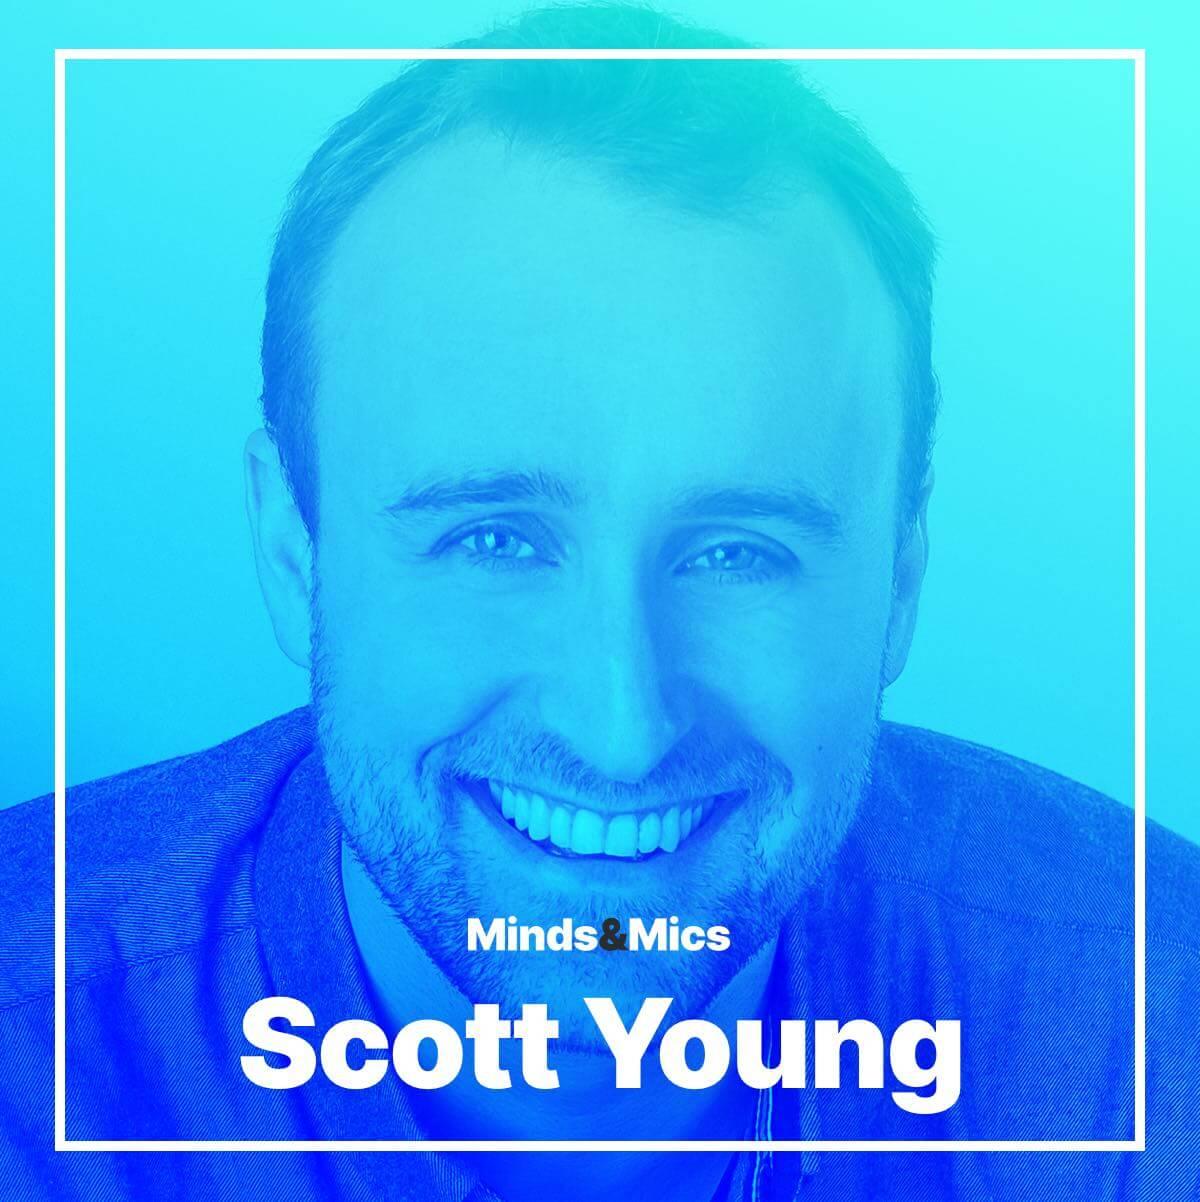 Scott Young Nick Wignall Minds and Mics